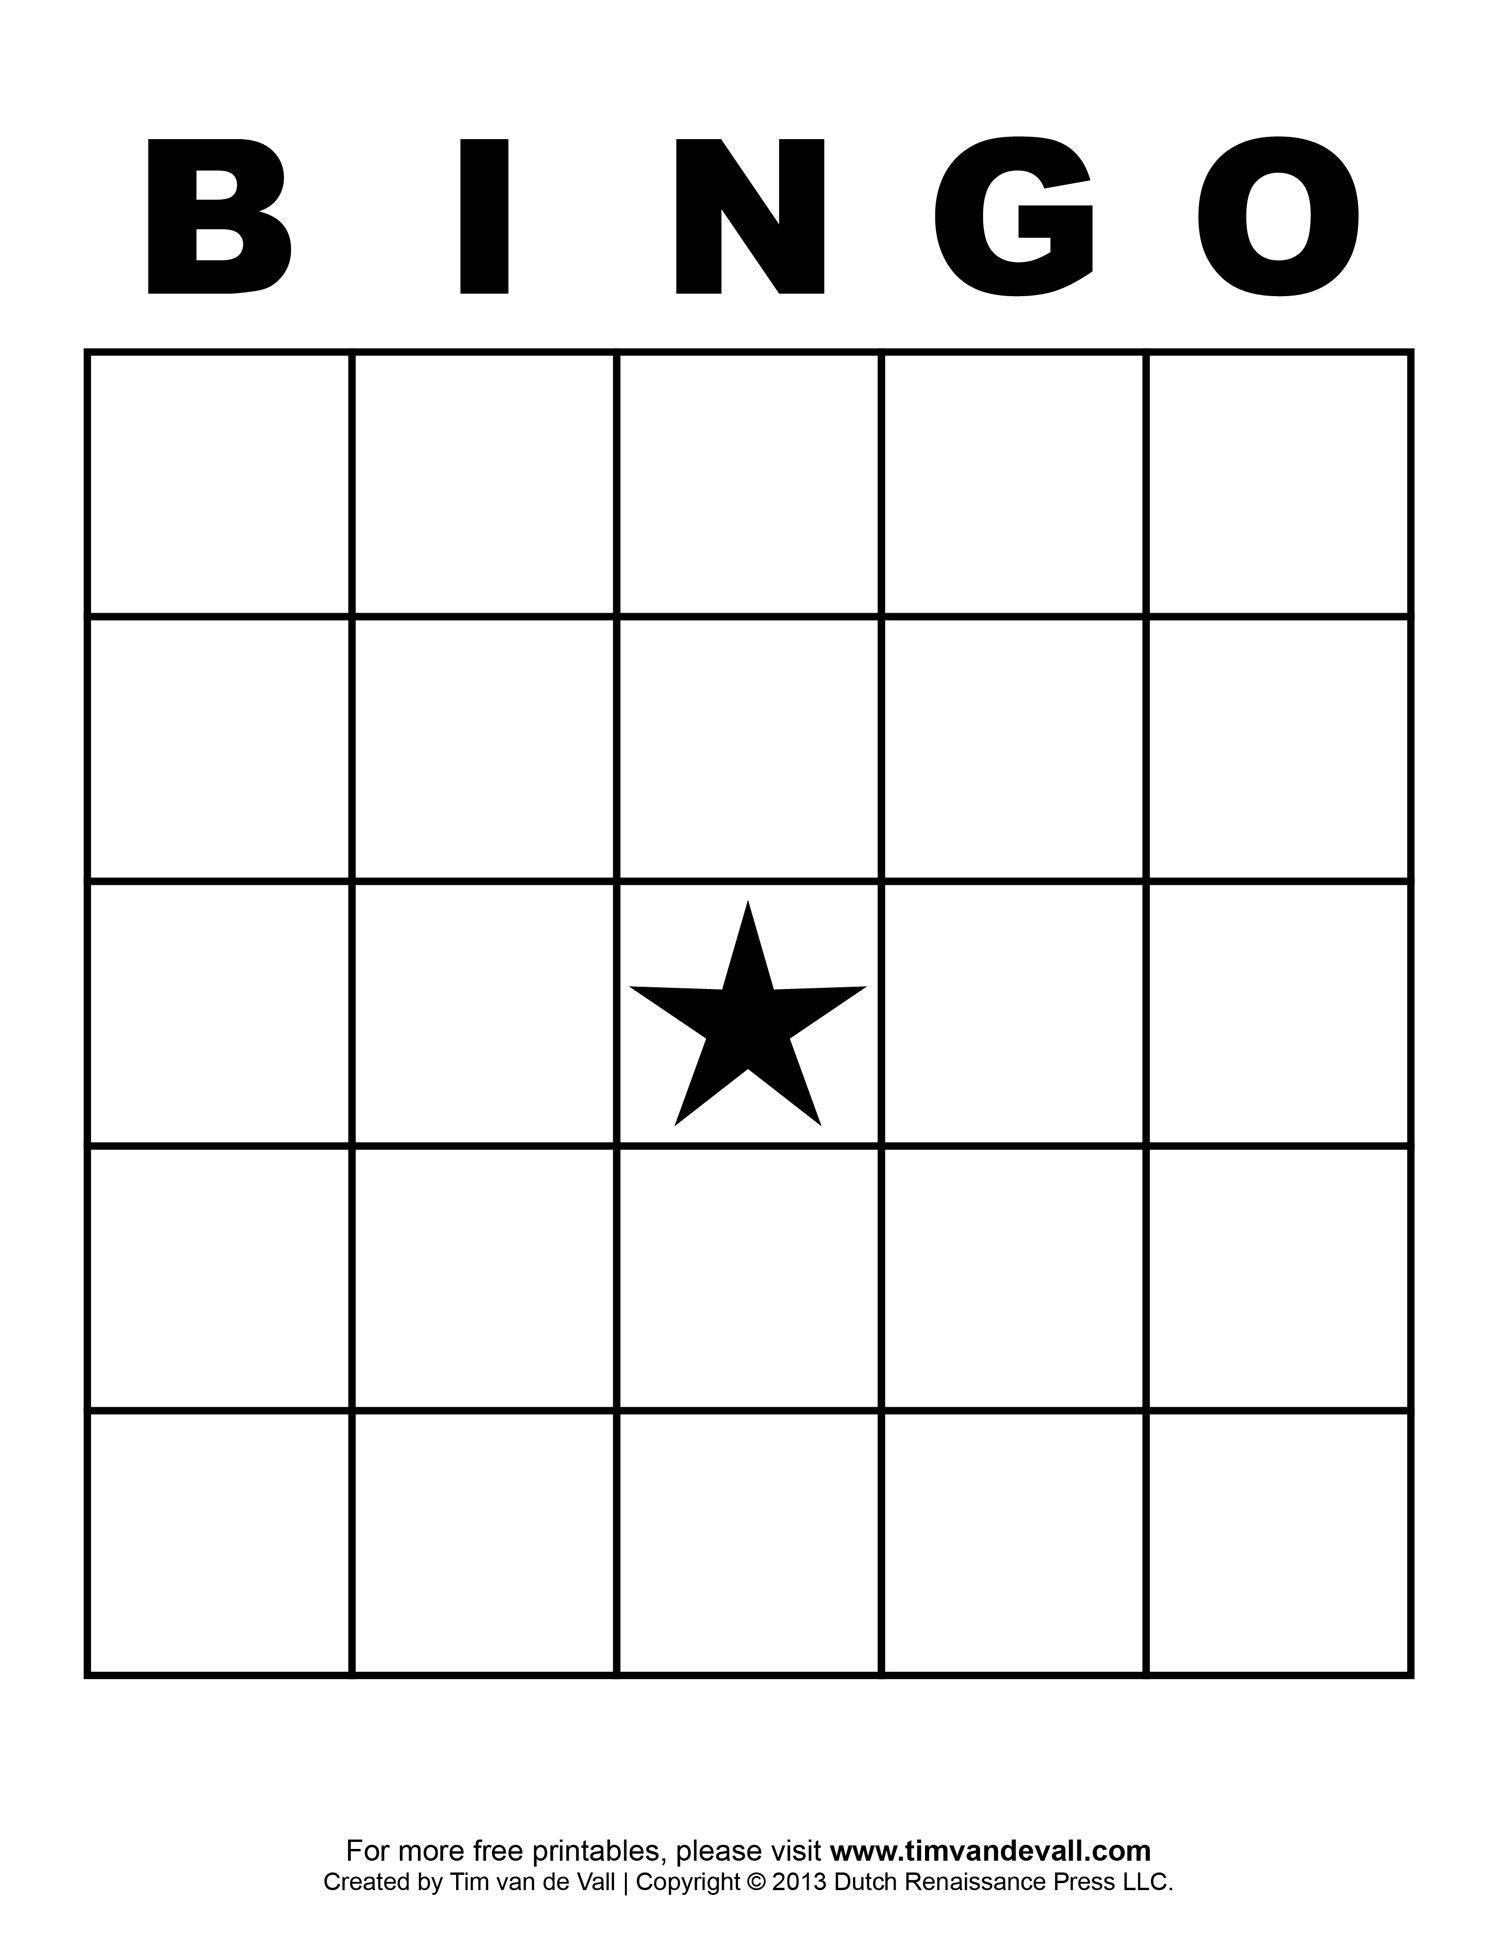 Free Printable Blank Bingo Cards Template 4 X 4 | Classroom | Sight - Free Printable Blank Bingo Cards